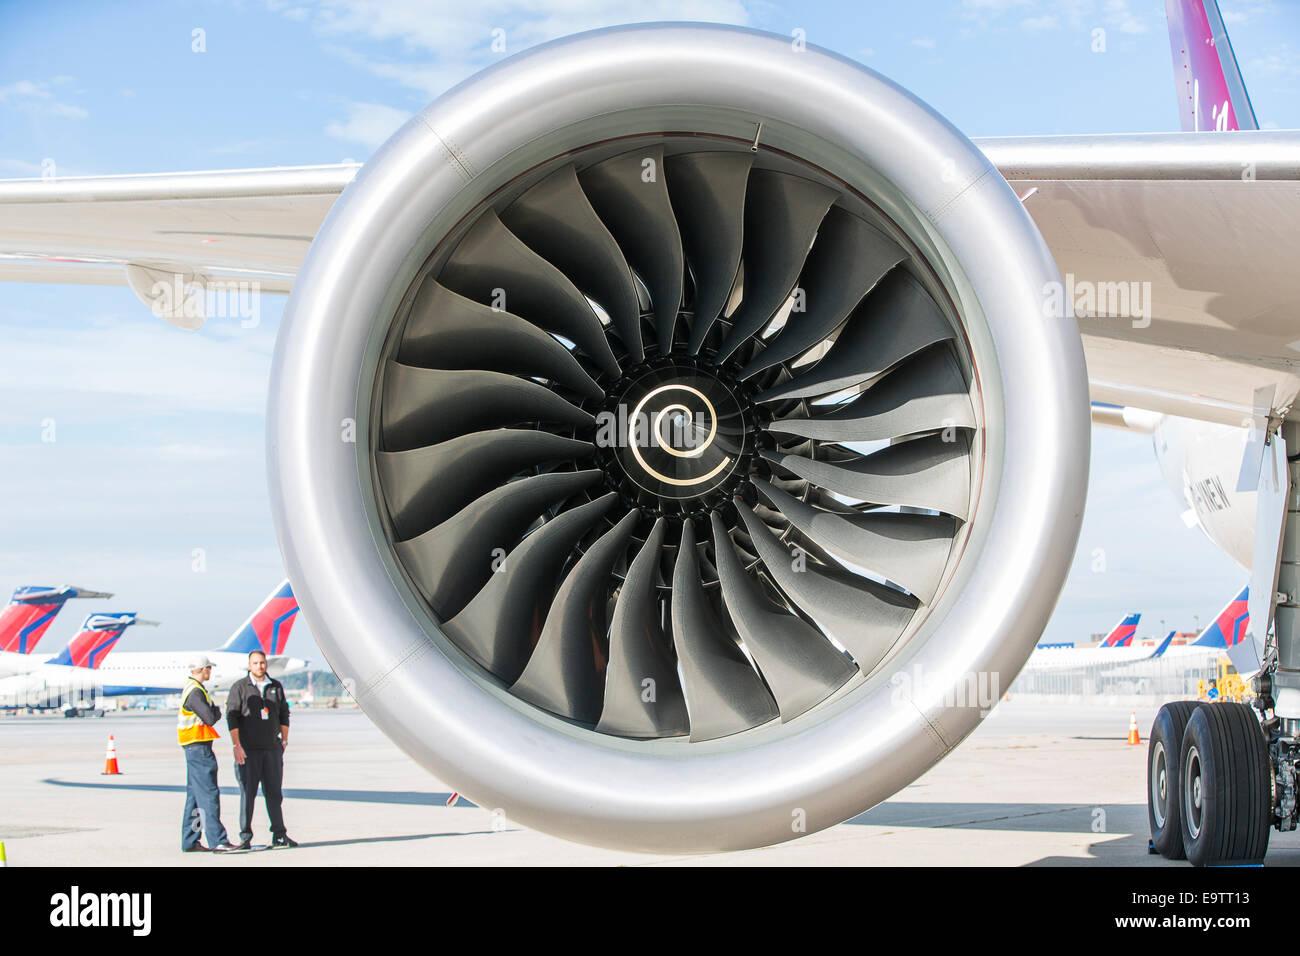 A Rolls Royce Trent 1000 turbofan engine mounted on a new Boeing 787 Dreamliner for Virgin Atlantic. - Stock Image